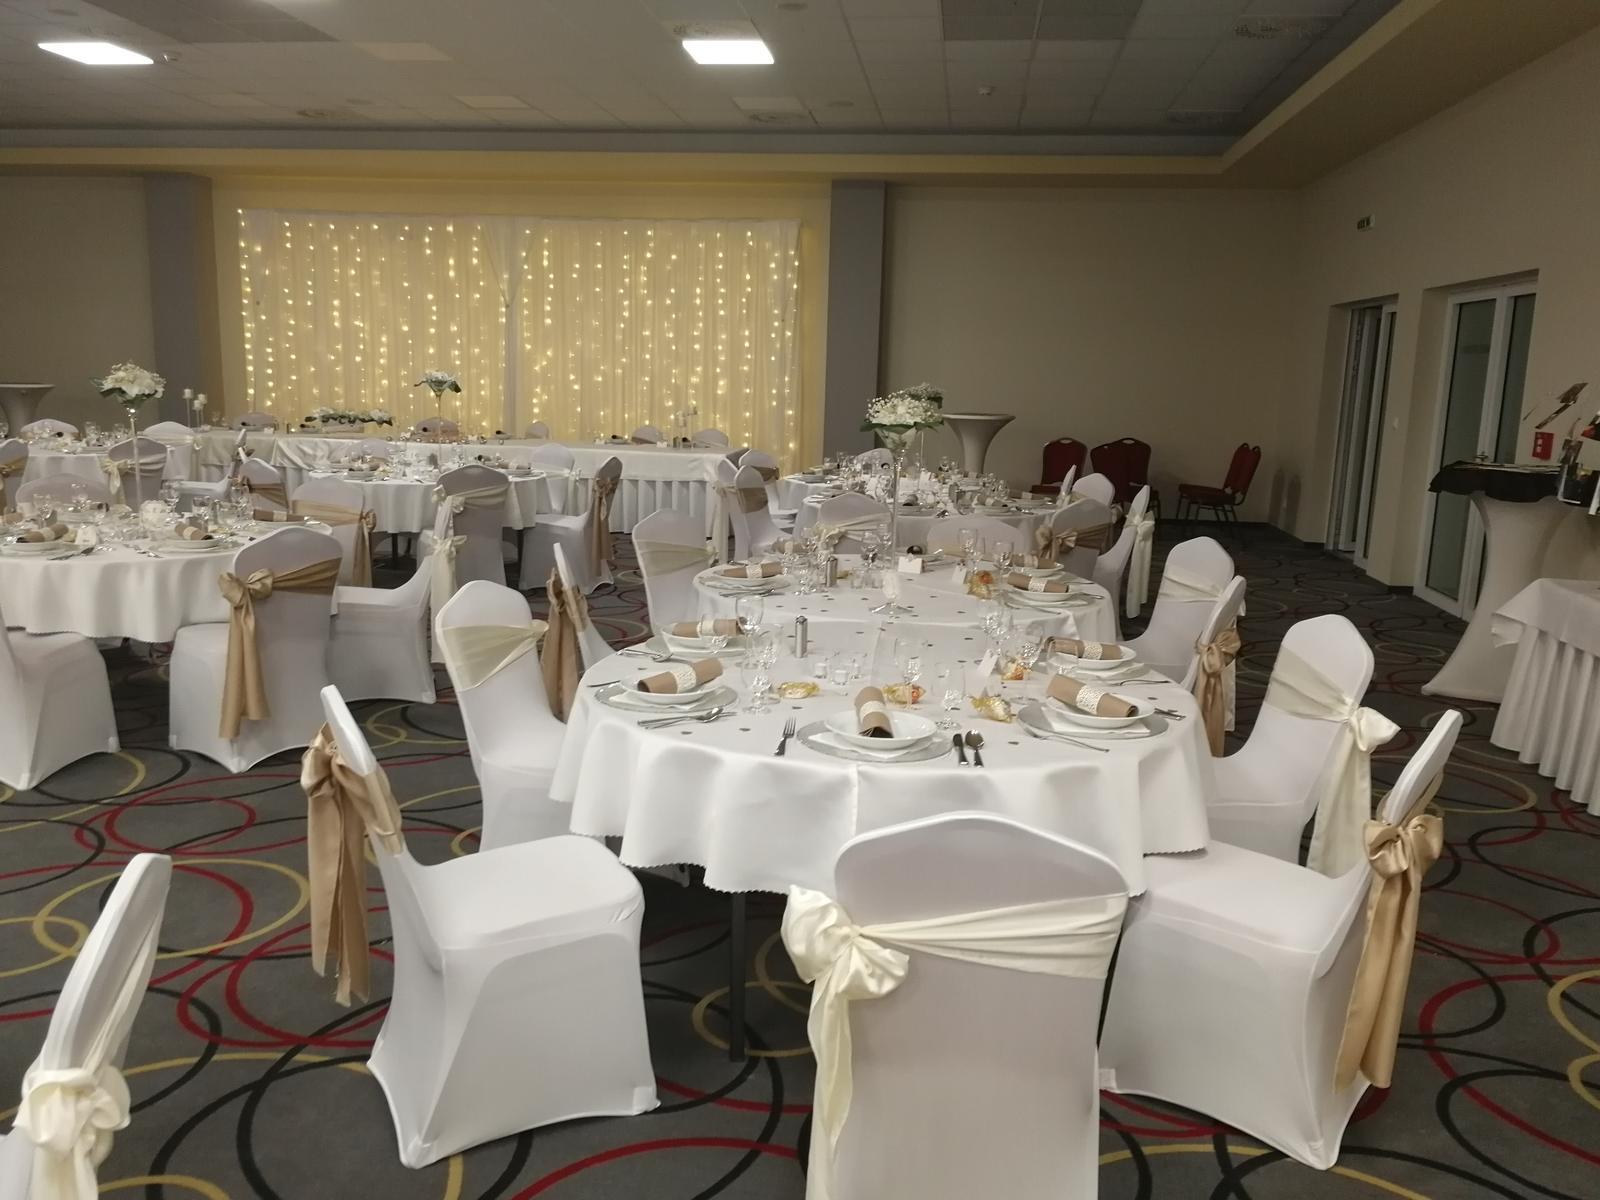 Svadba 7.4.2018 Zvolen Hotel TENIS - Obrázok č. 3